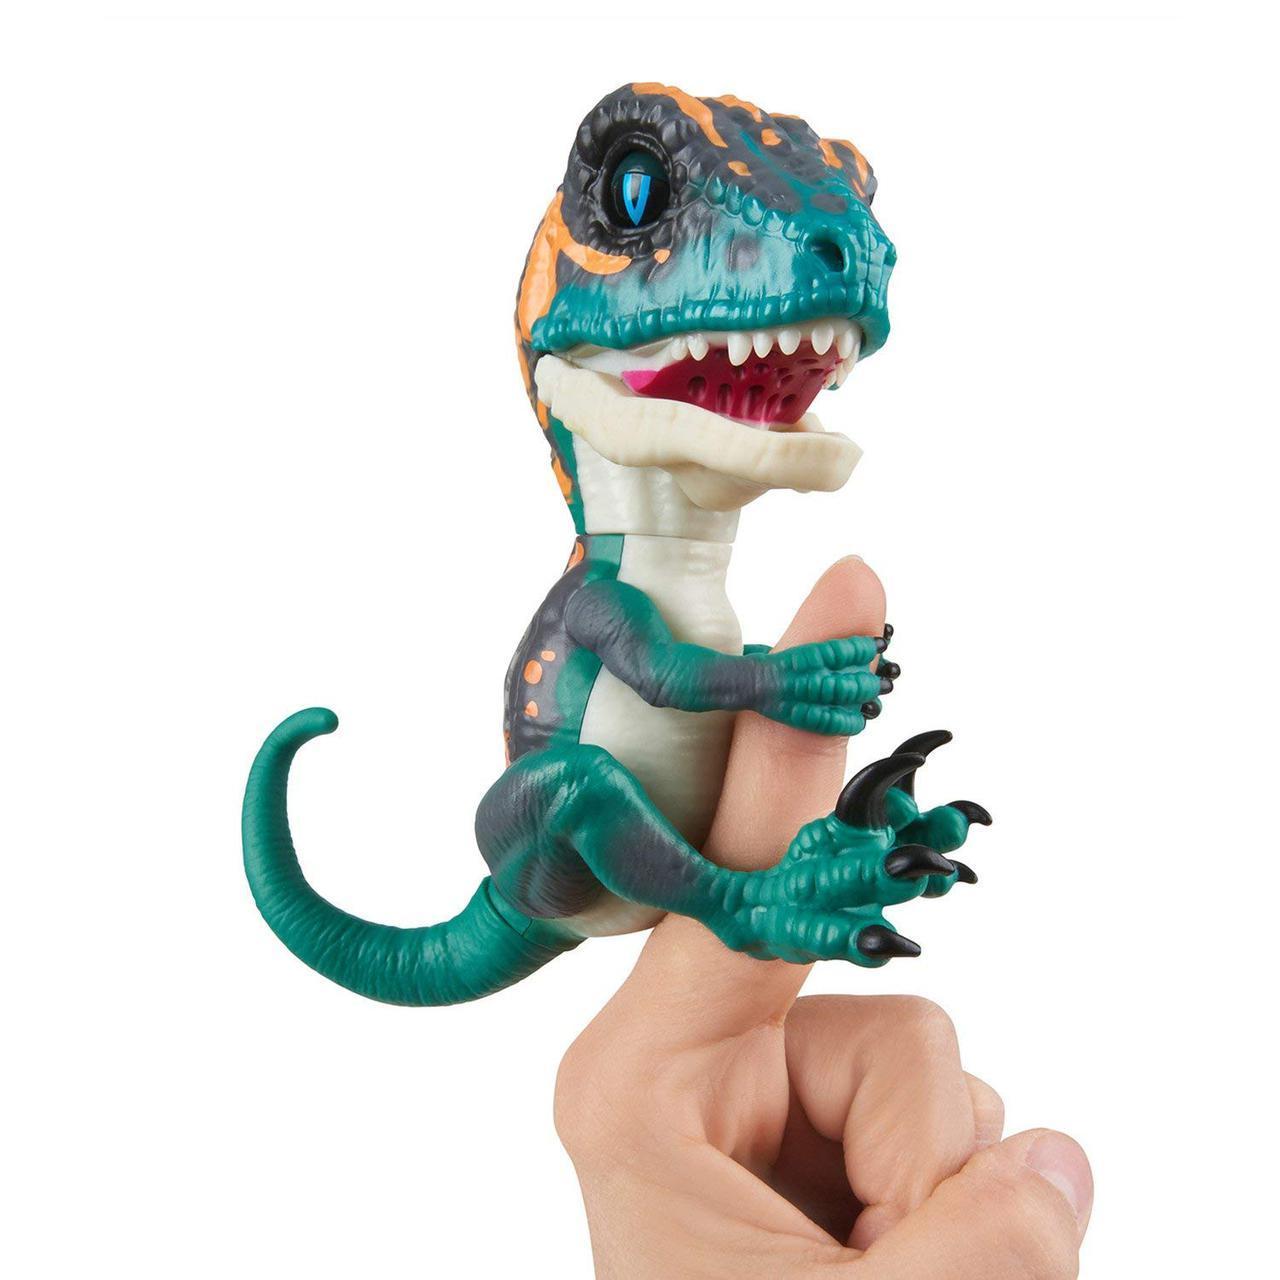 Оригинал Интерактивный коллекционный динозавр Фьёри фингерлинг Untamed Raptor by Fingerlings - Fury by WowWee